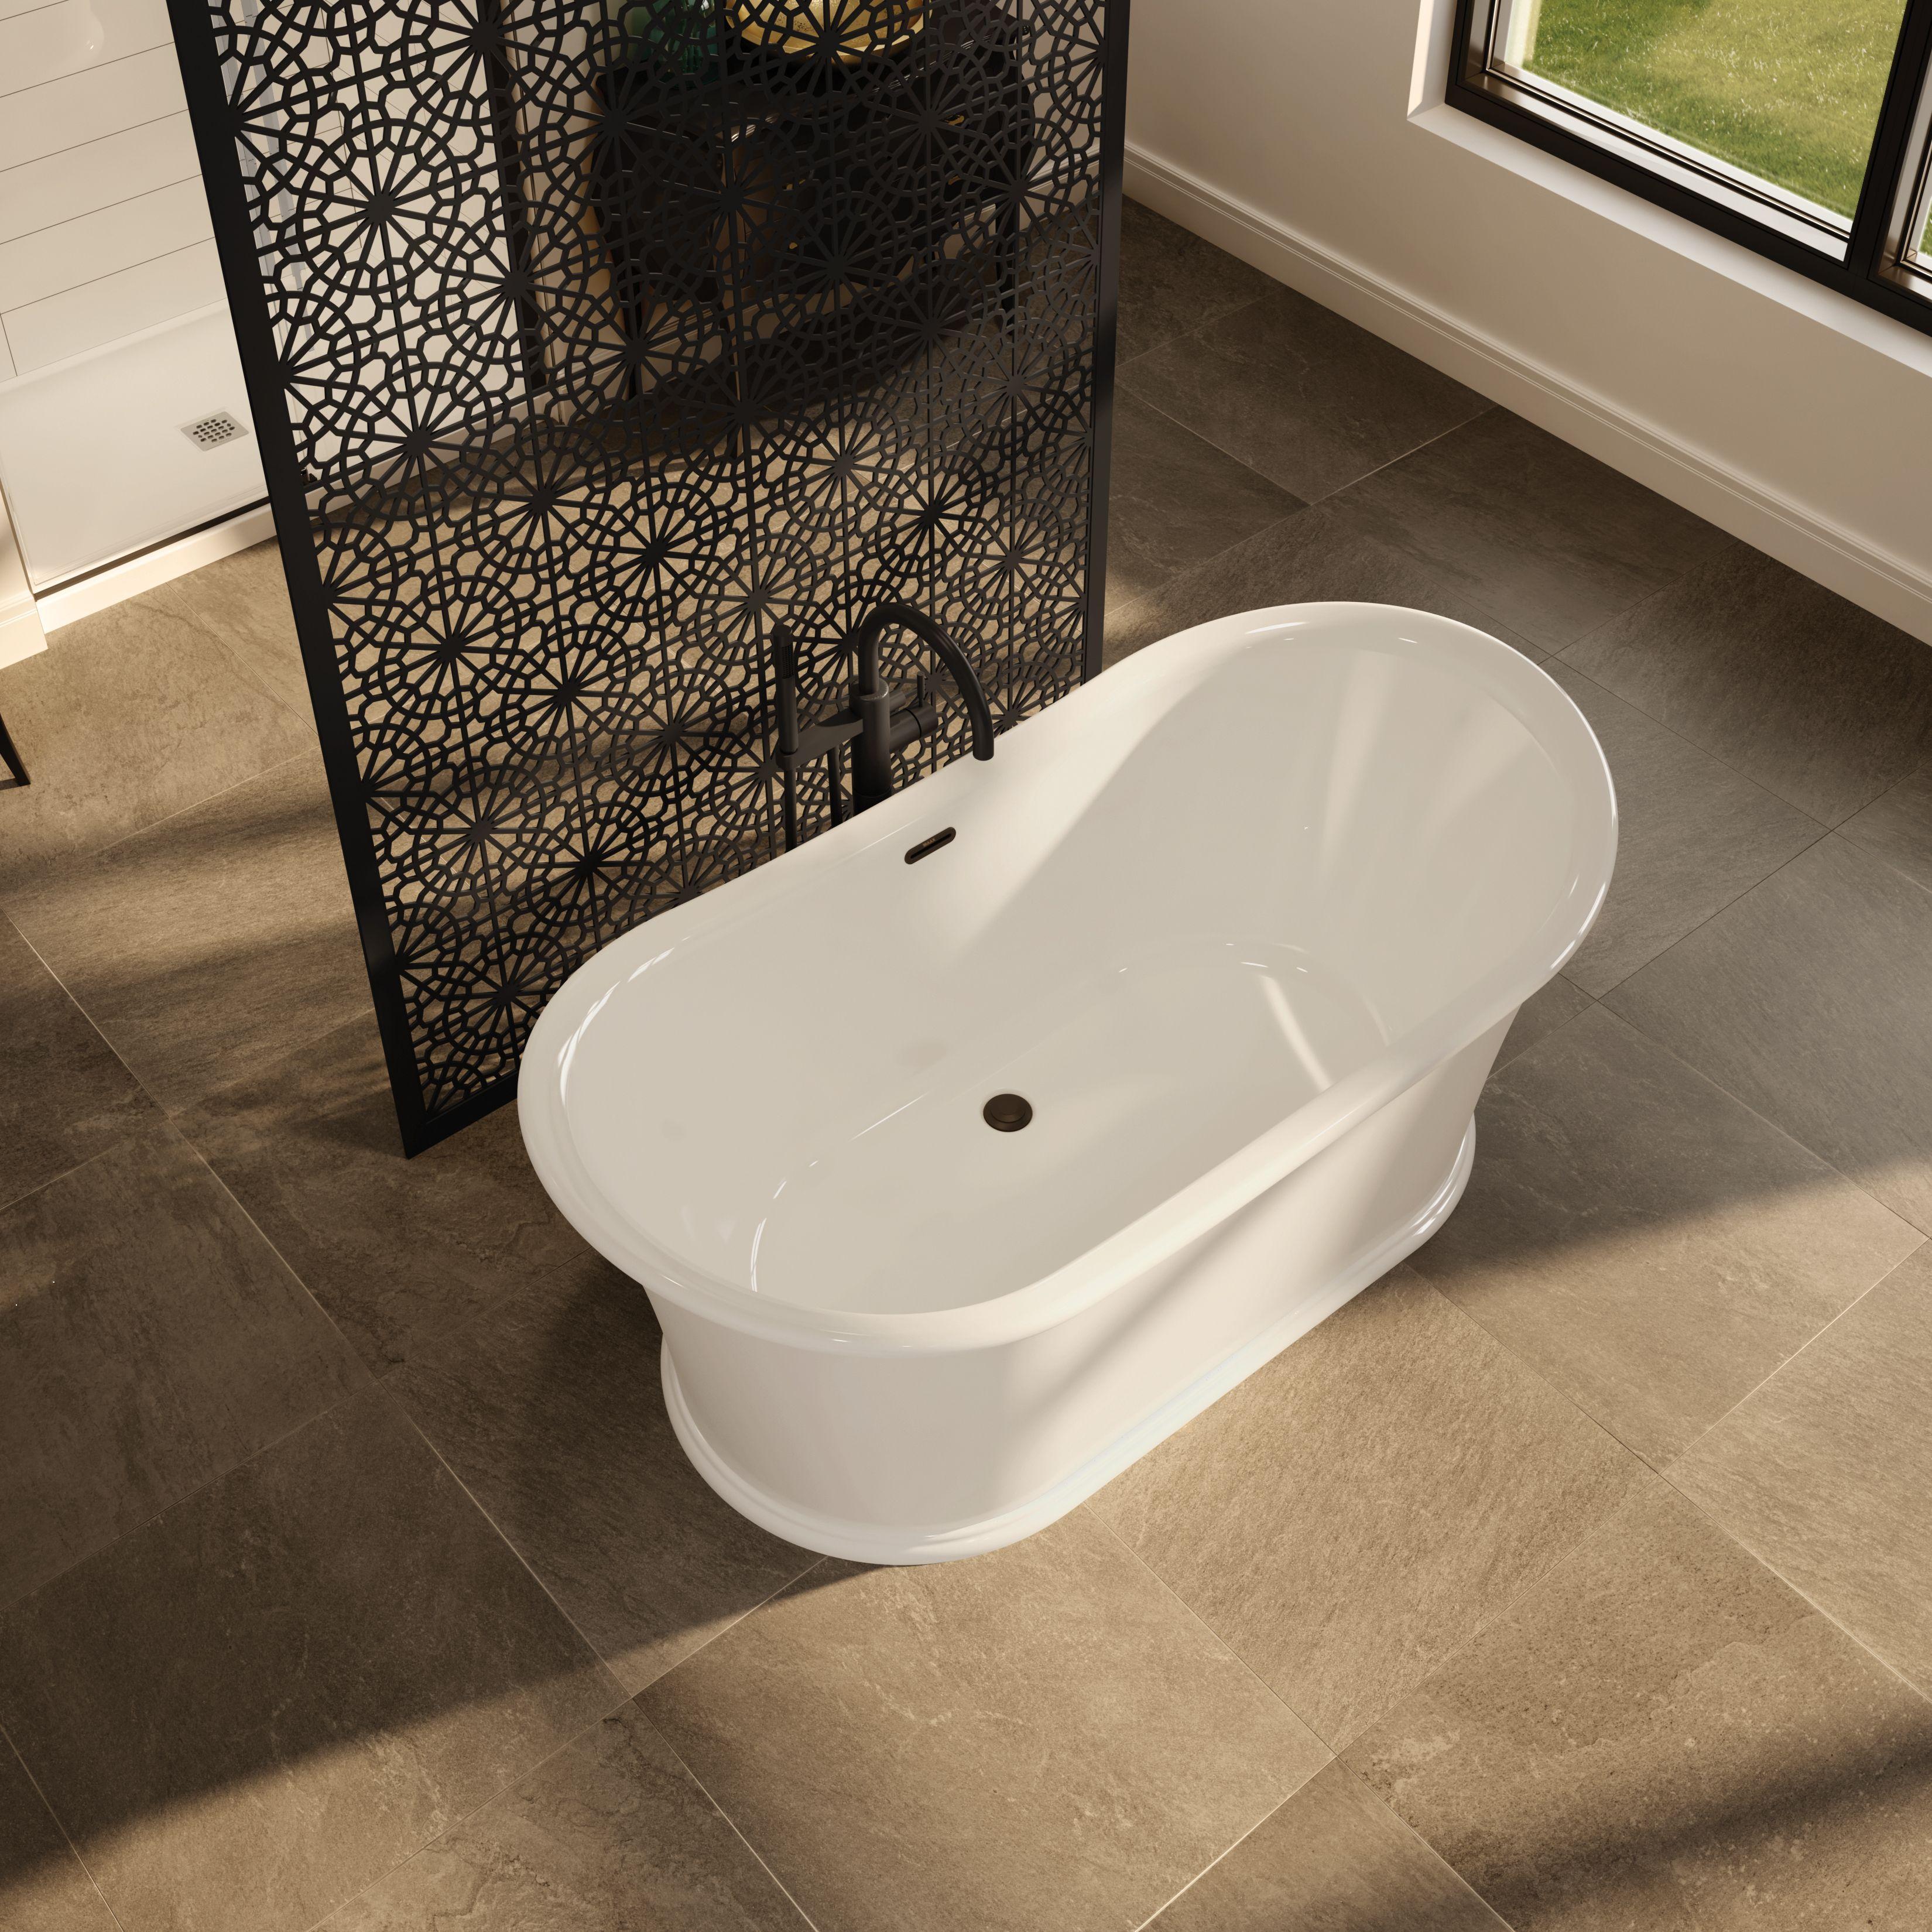 Elina | Bathroom Fixtures | Pinterest | Dream bathrooms, Bathroom ...